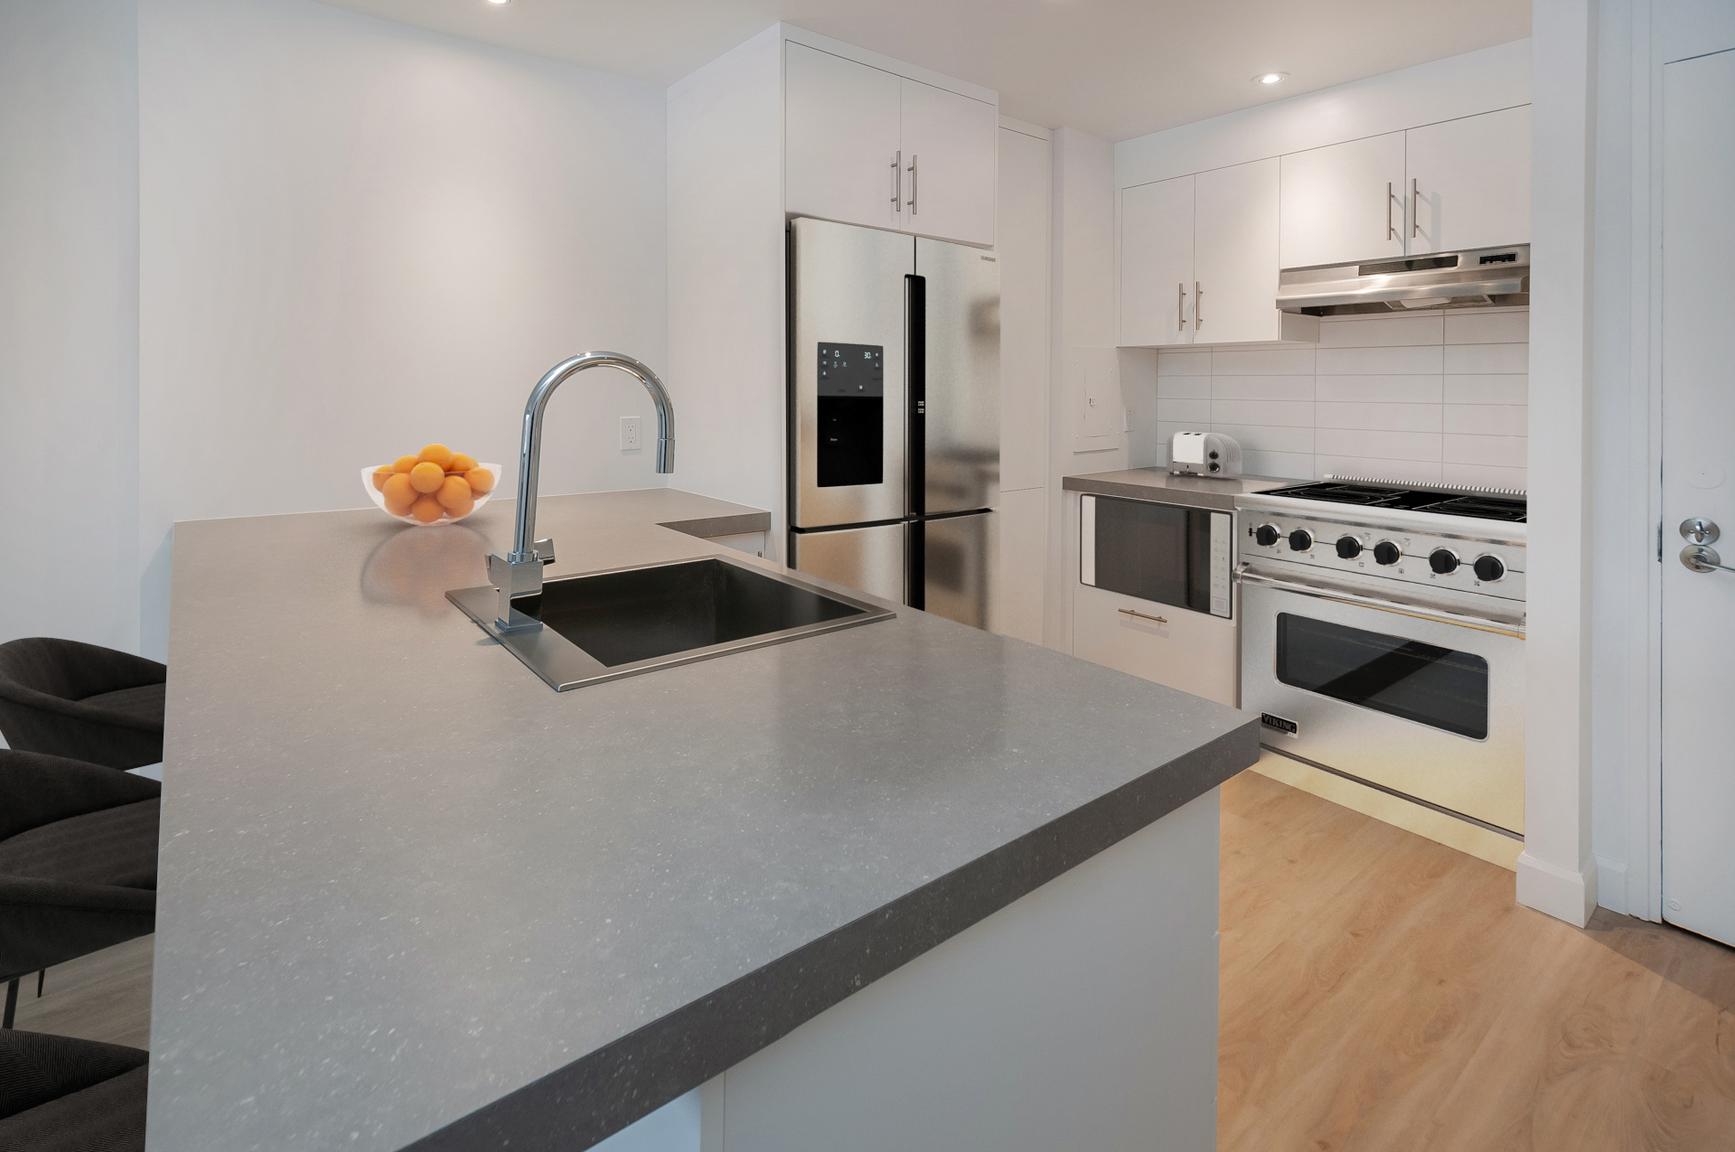 1 bedroom Apartments for rent in Quebec City at Les Jardins de Merici - Photo 18 - RentersPages – L407121